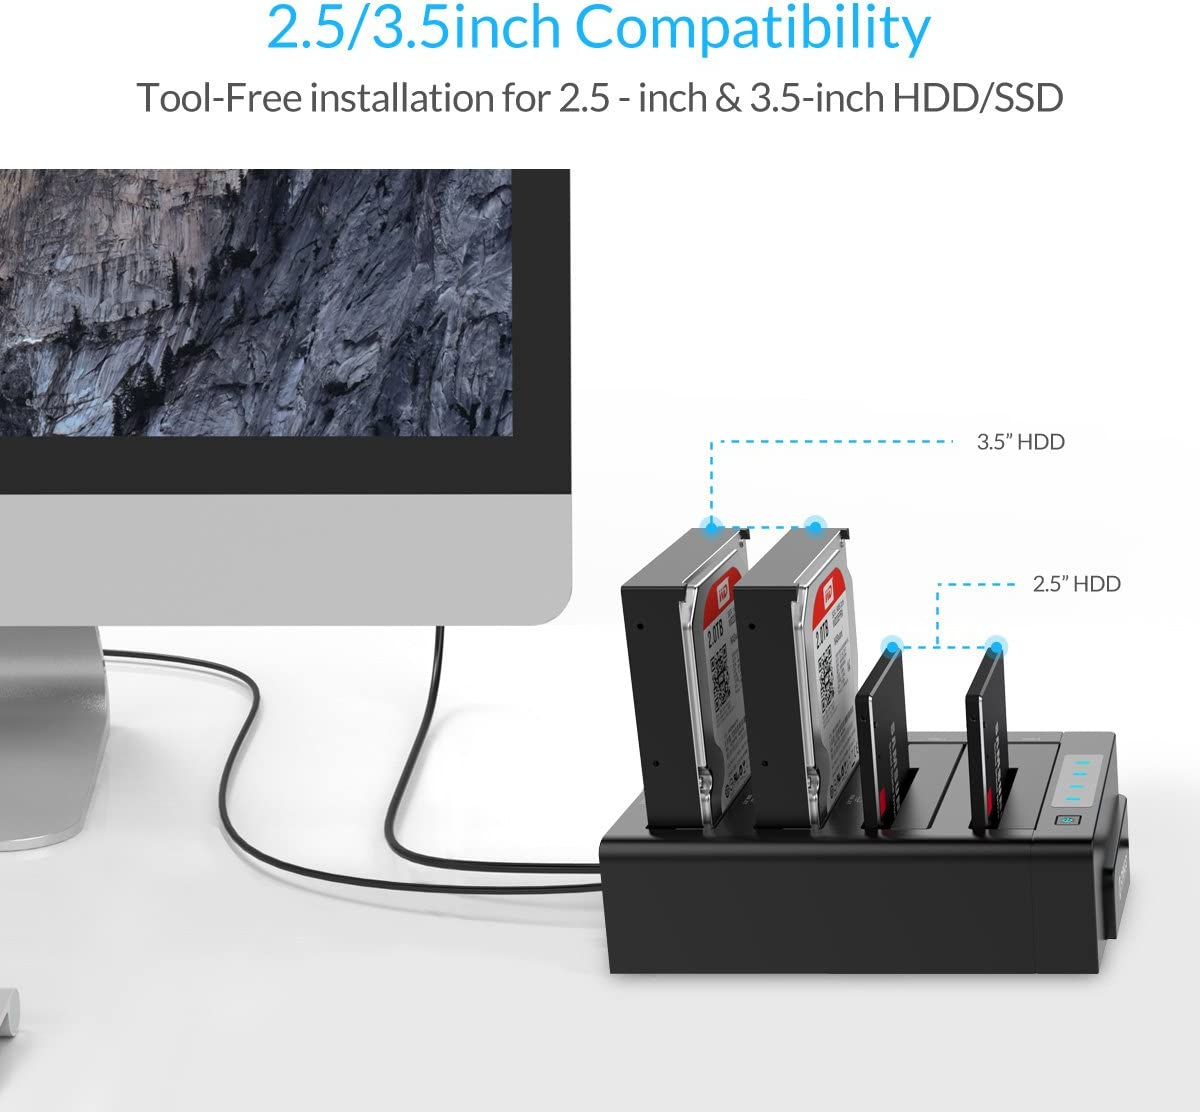 ORICO Base de conexion Docking Station USB 3.0 a SATA Admite 40TB ...